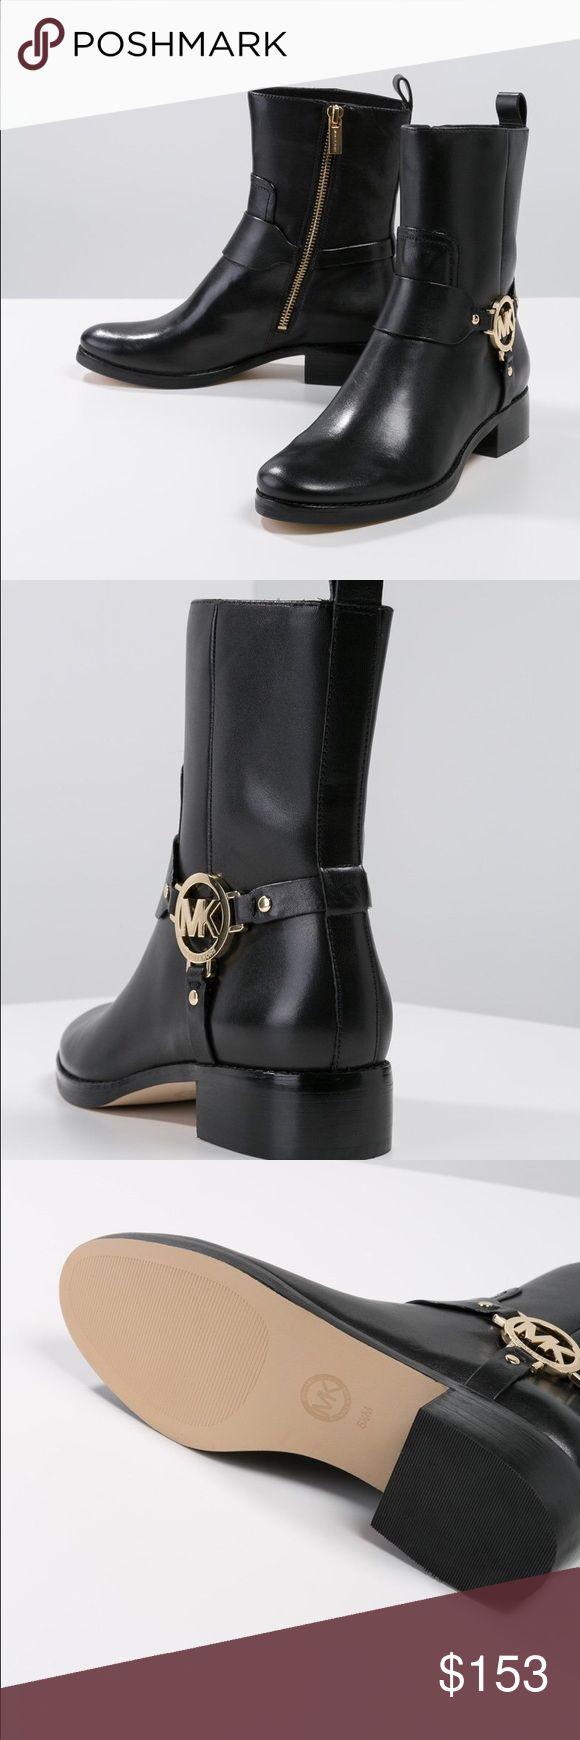 Michael Kors FULTON HARNESS Mk Boots black Women Brand new without box  Michael Kors FULTON HARNESS Mk Boots black Women Michael Kors Shoes Ankle Boots & Booties